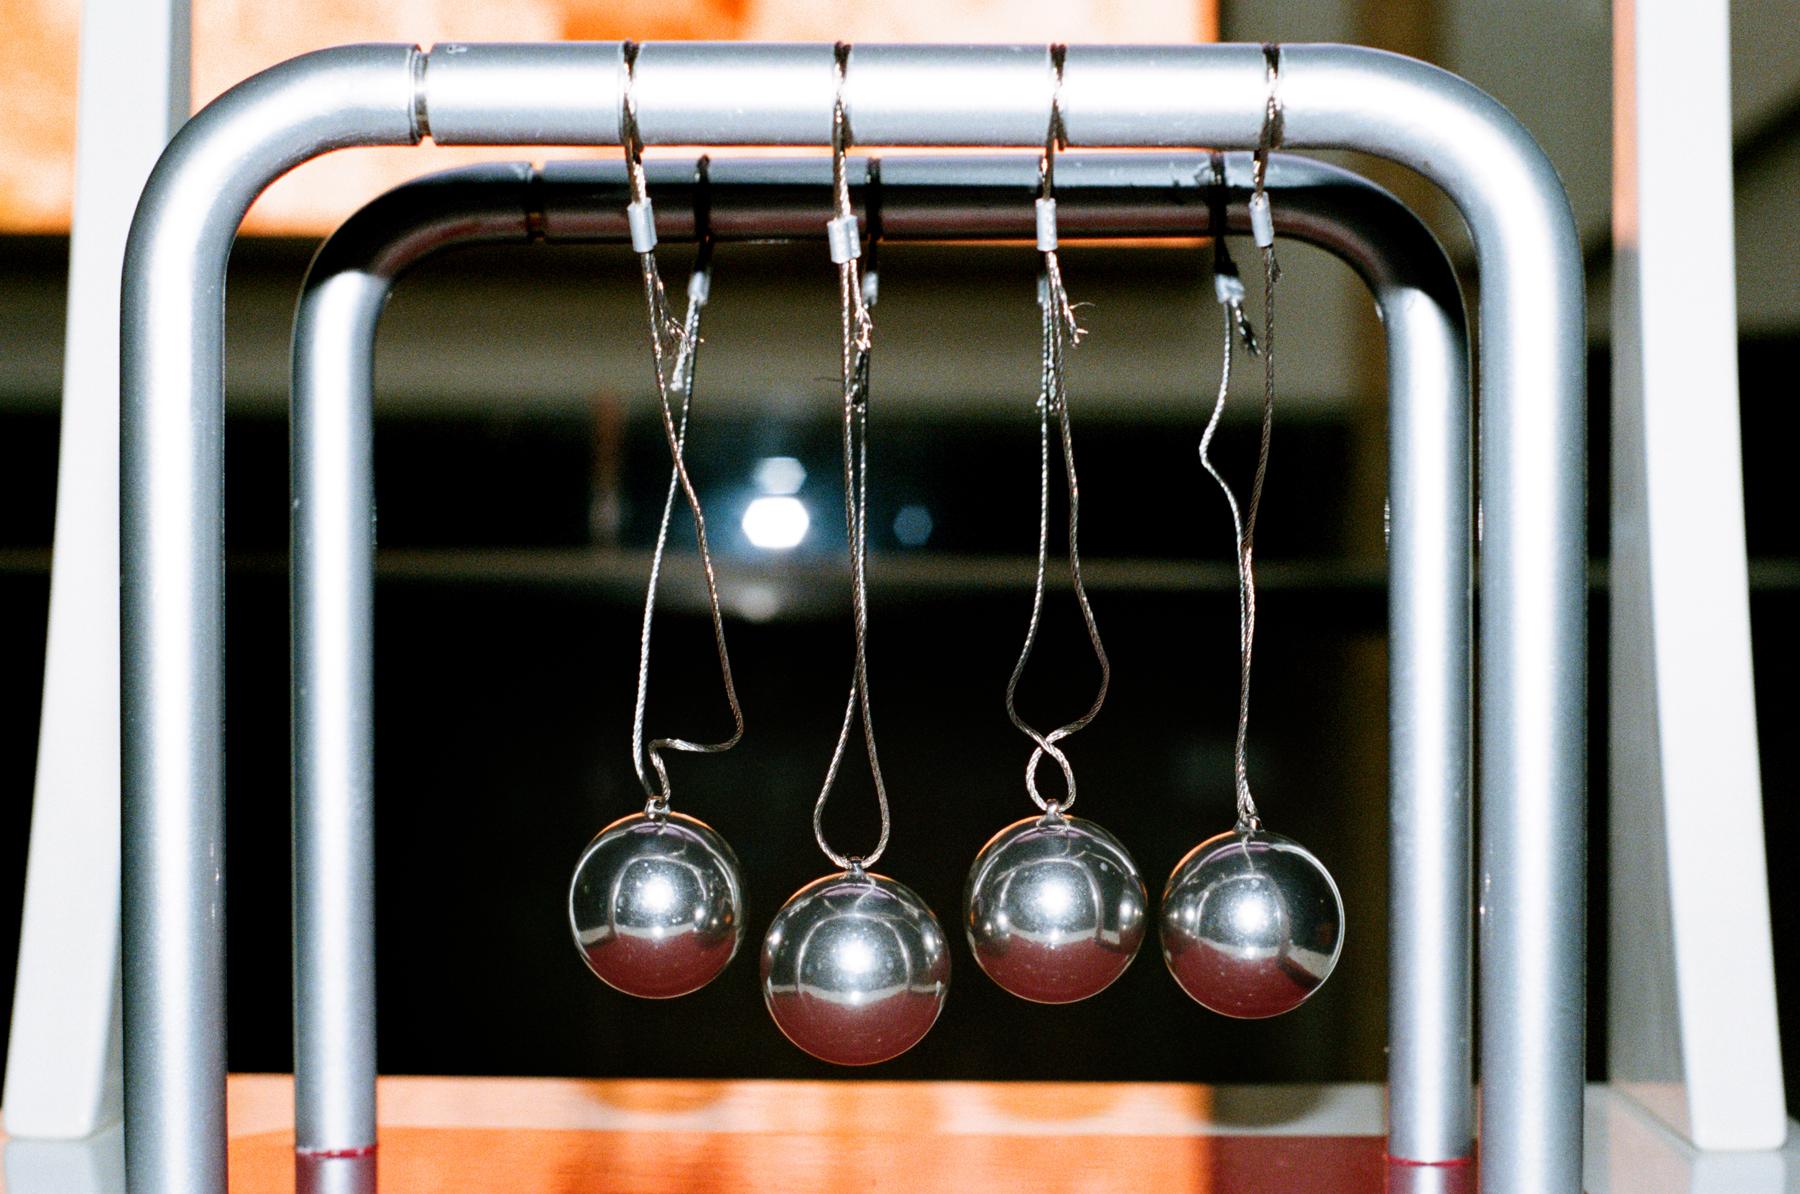 An imitation of a Billard Ball model in the Shenzhen Science Museum